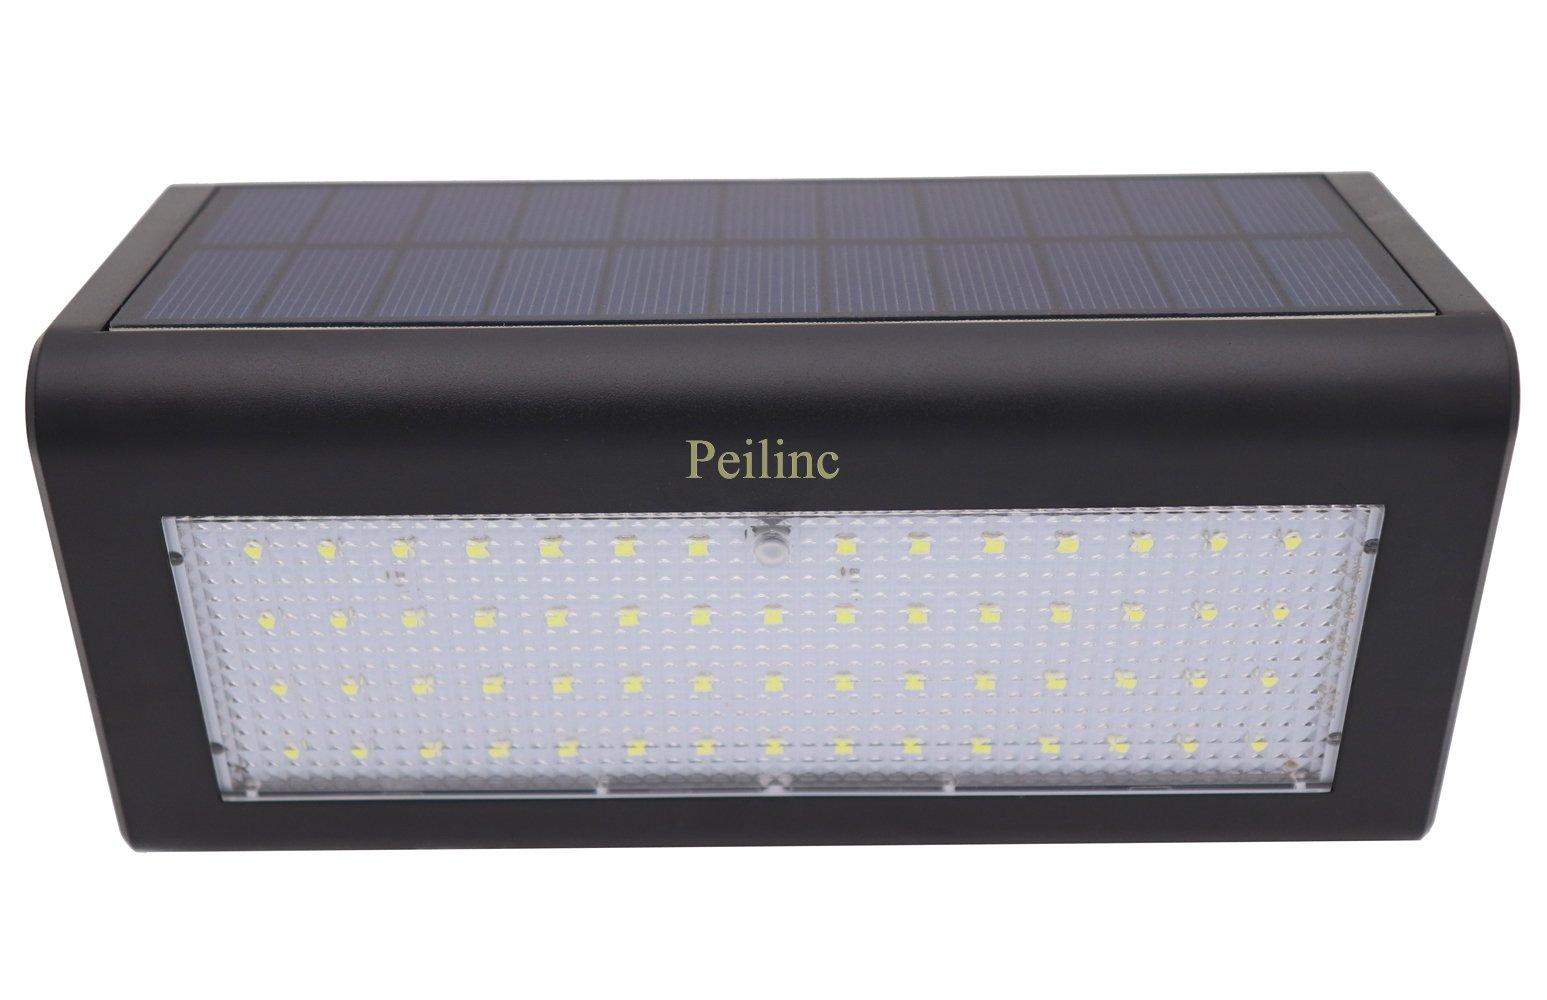 Peilinc Super Bright 59 LED 1200 Lumens Wireless Water Proof Solar Lights Outdoor Radar Motion Sensor Light for Outdoor Front Door, Back Yard, Patio, Driveway, Garage, Wall Light -Black